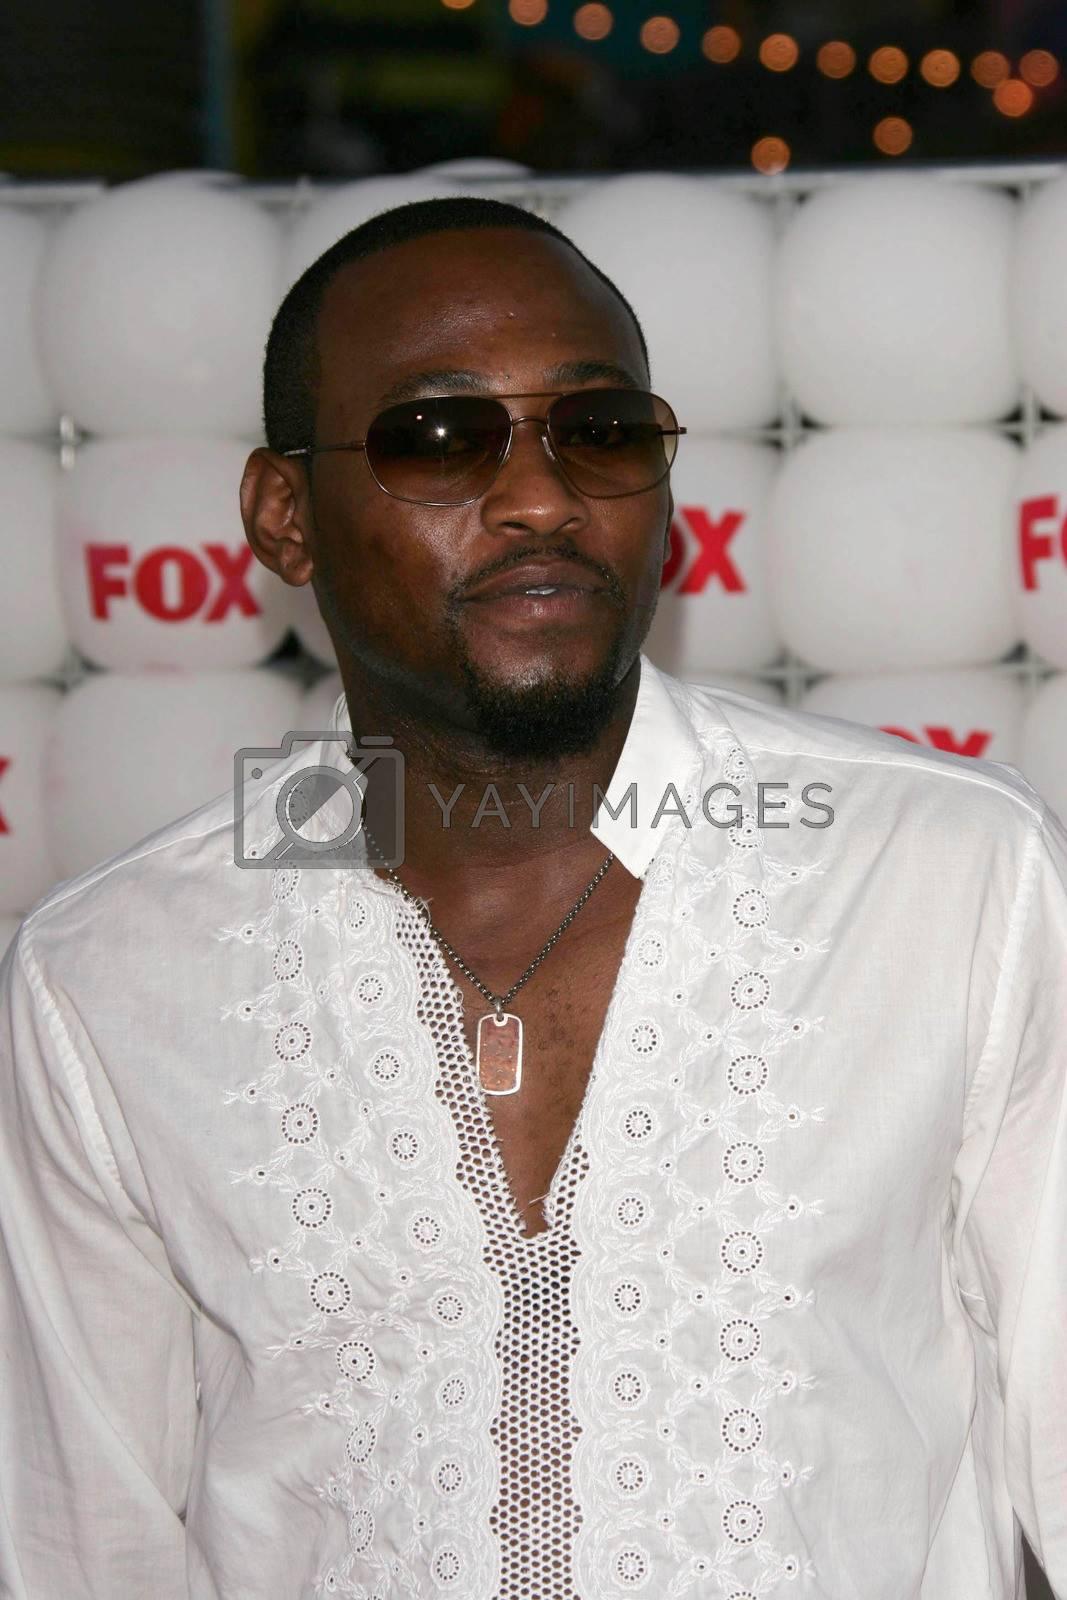 Omar Epps At the FOX Summer 2005 TCA Party, Santa Monica Pier, Santa Monica, CA 07-29-05